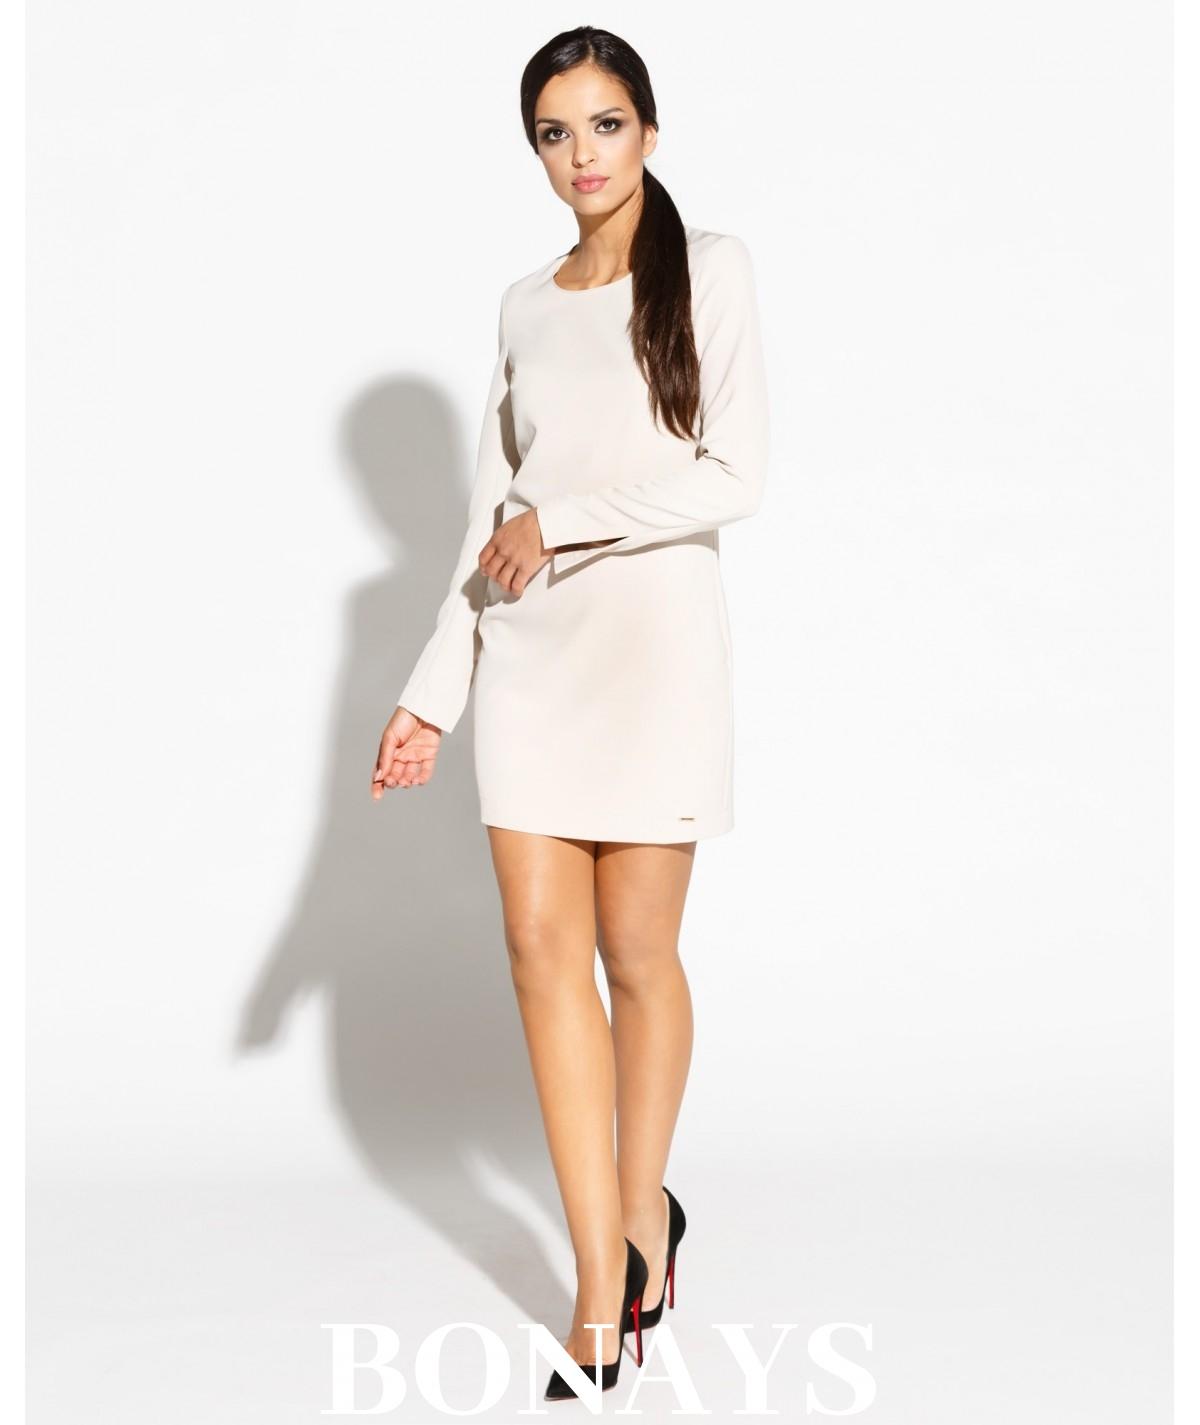 Bezowa sukienka MIKO - producent Dursi